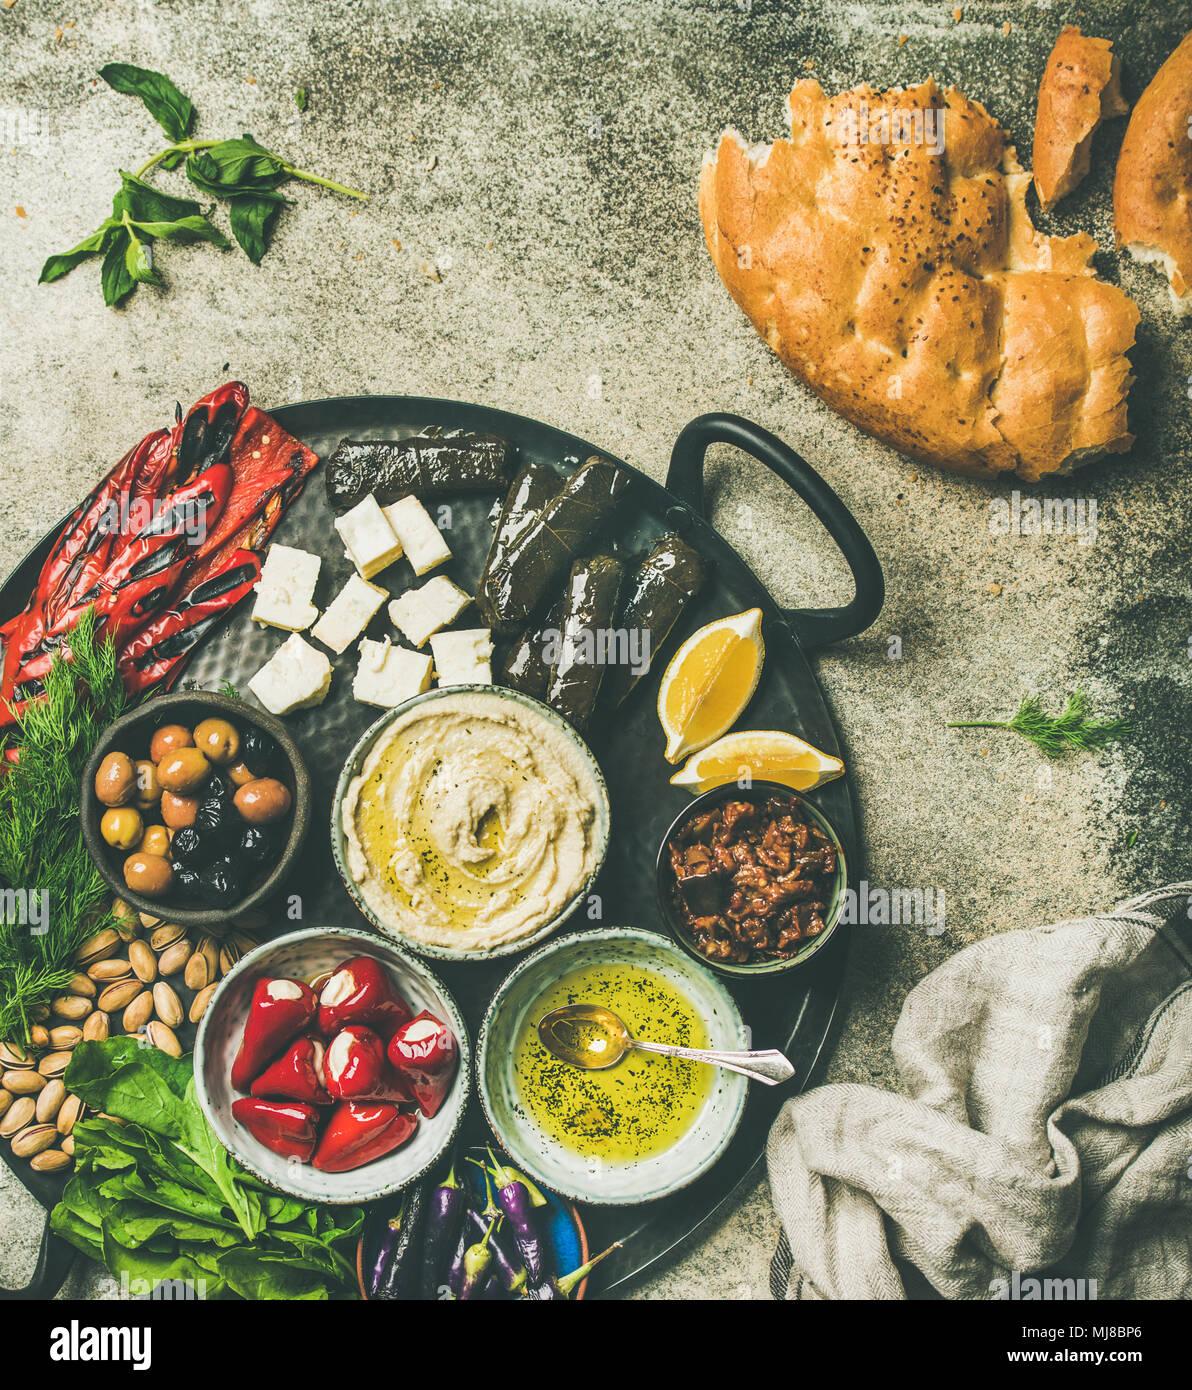 Mediterranean meze starter fingerfood platter in tray - Stock Image